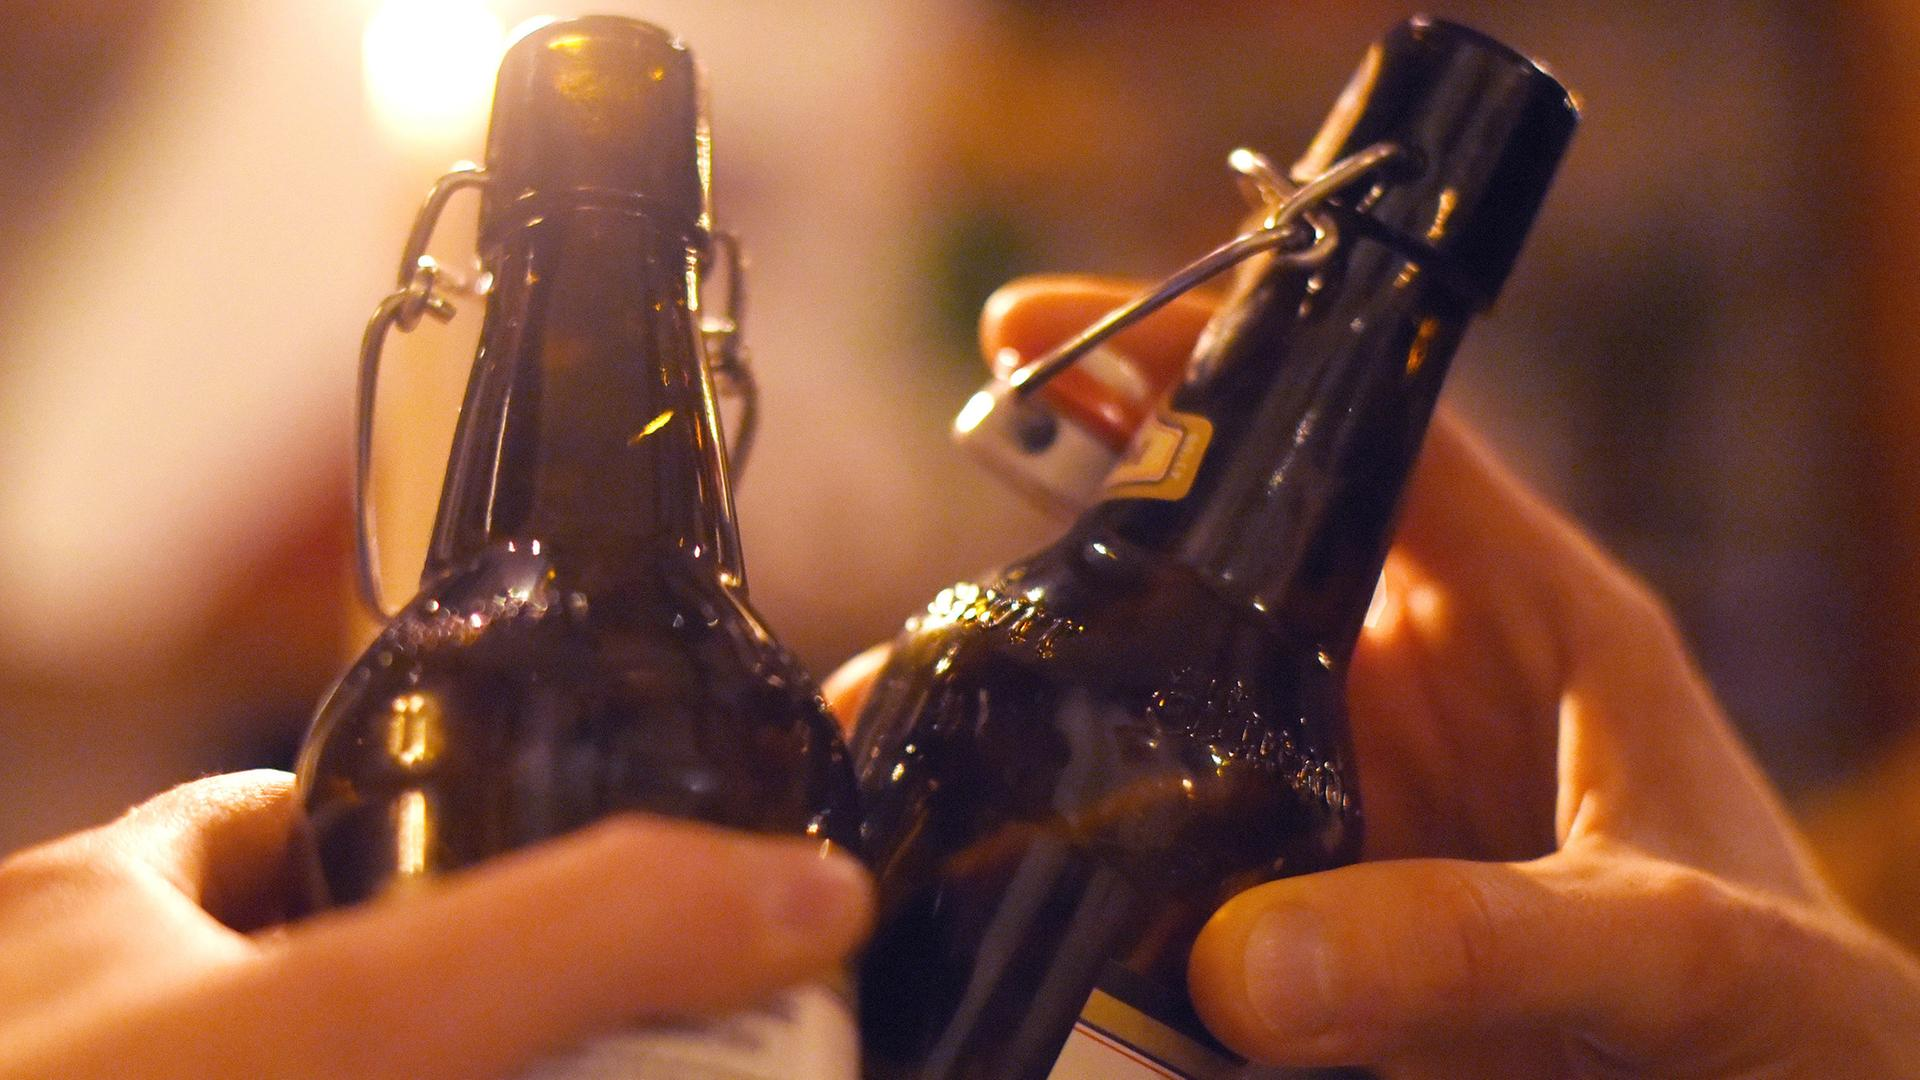 Alkoholatlas: Akademiker trinken mehr als Arbeiter - ZDFmediathek